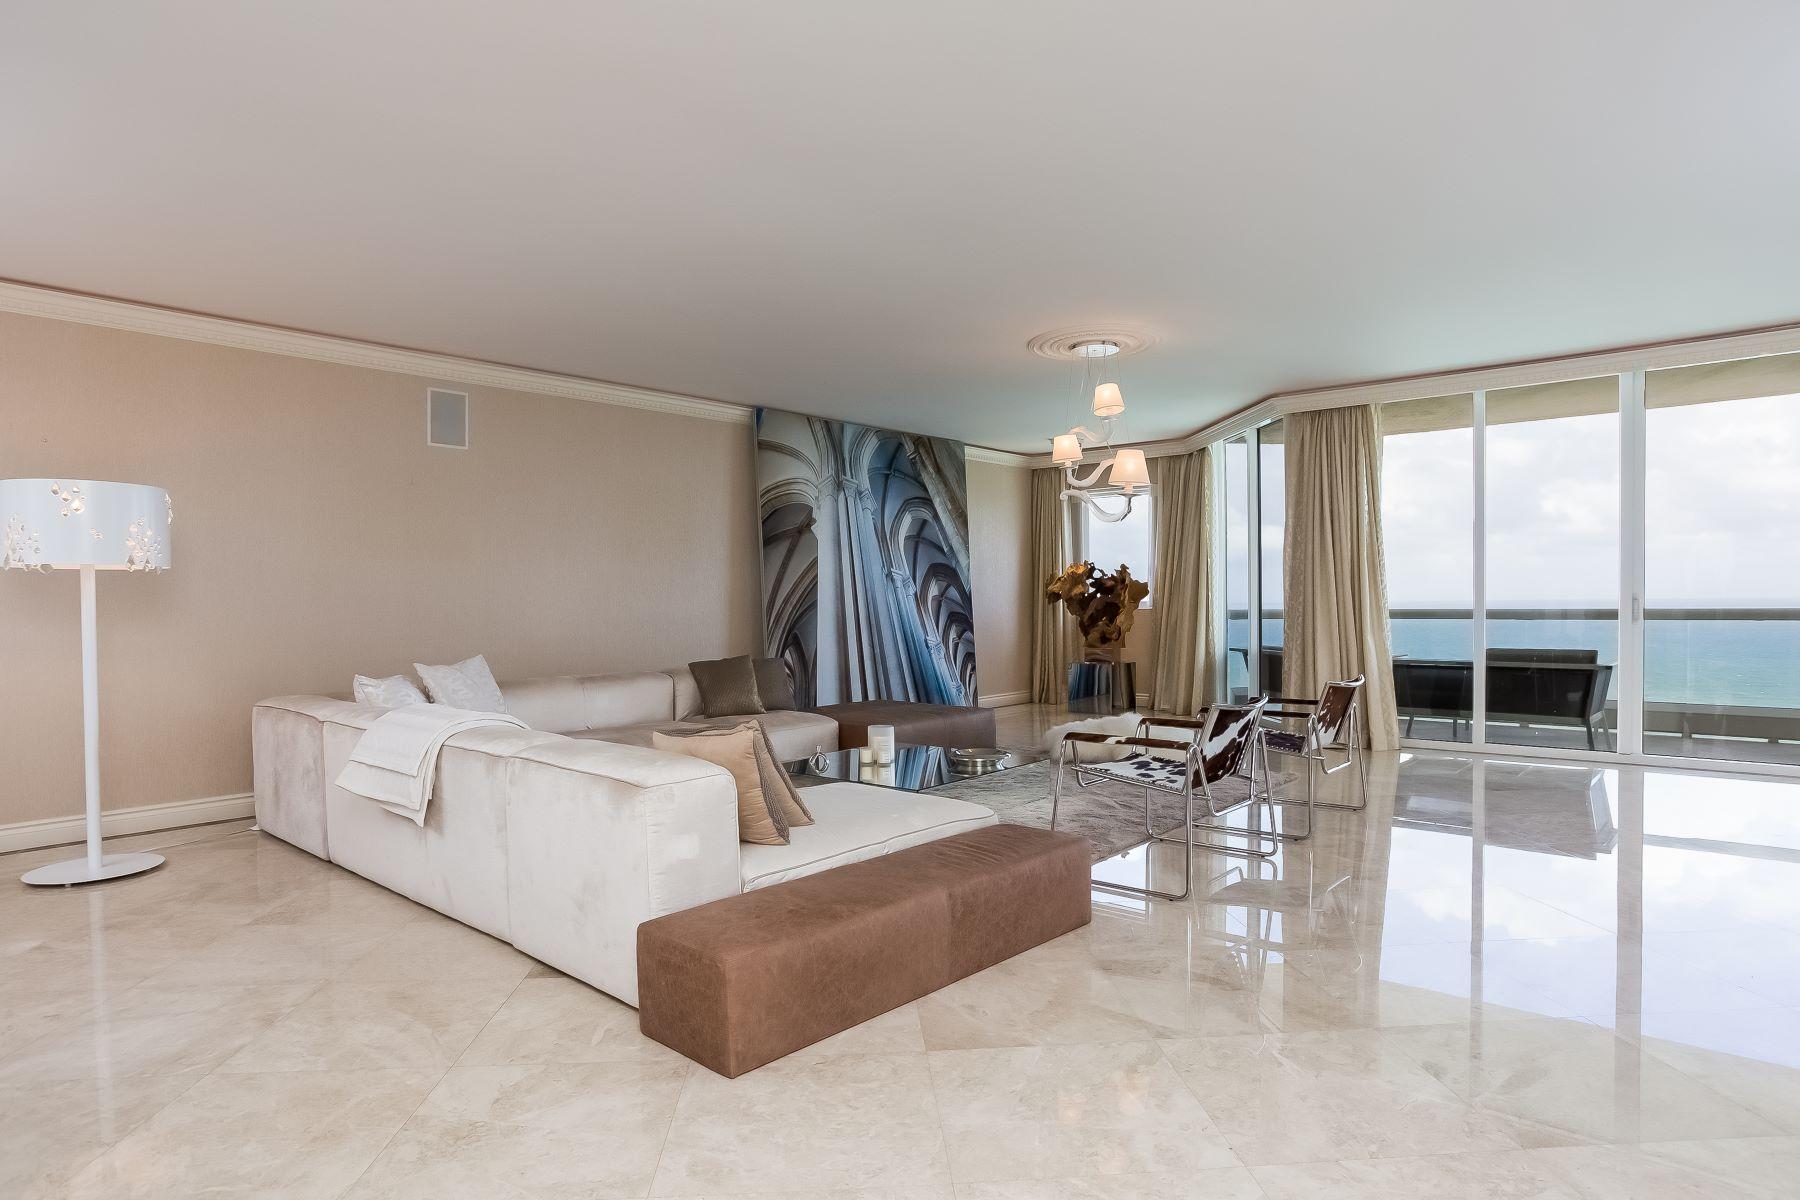 Condominium for Sale at 17875 Collins Av #3703 17875Collins Av 3703 Sunny Isles Beach, Florida, 33160 United States